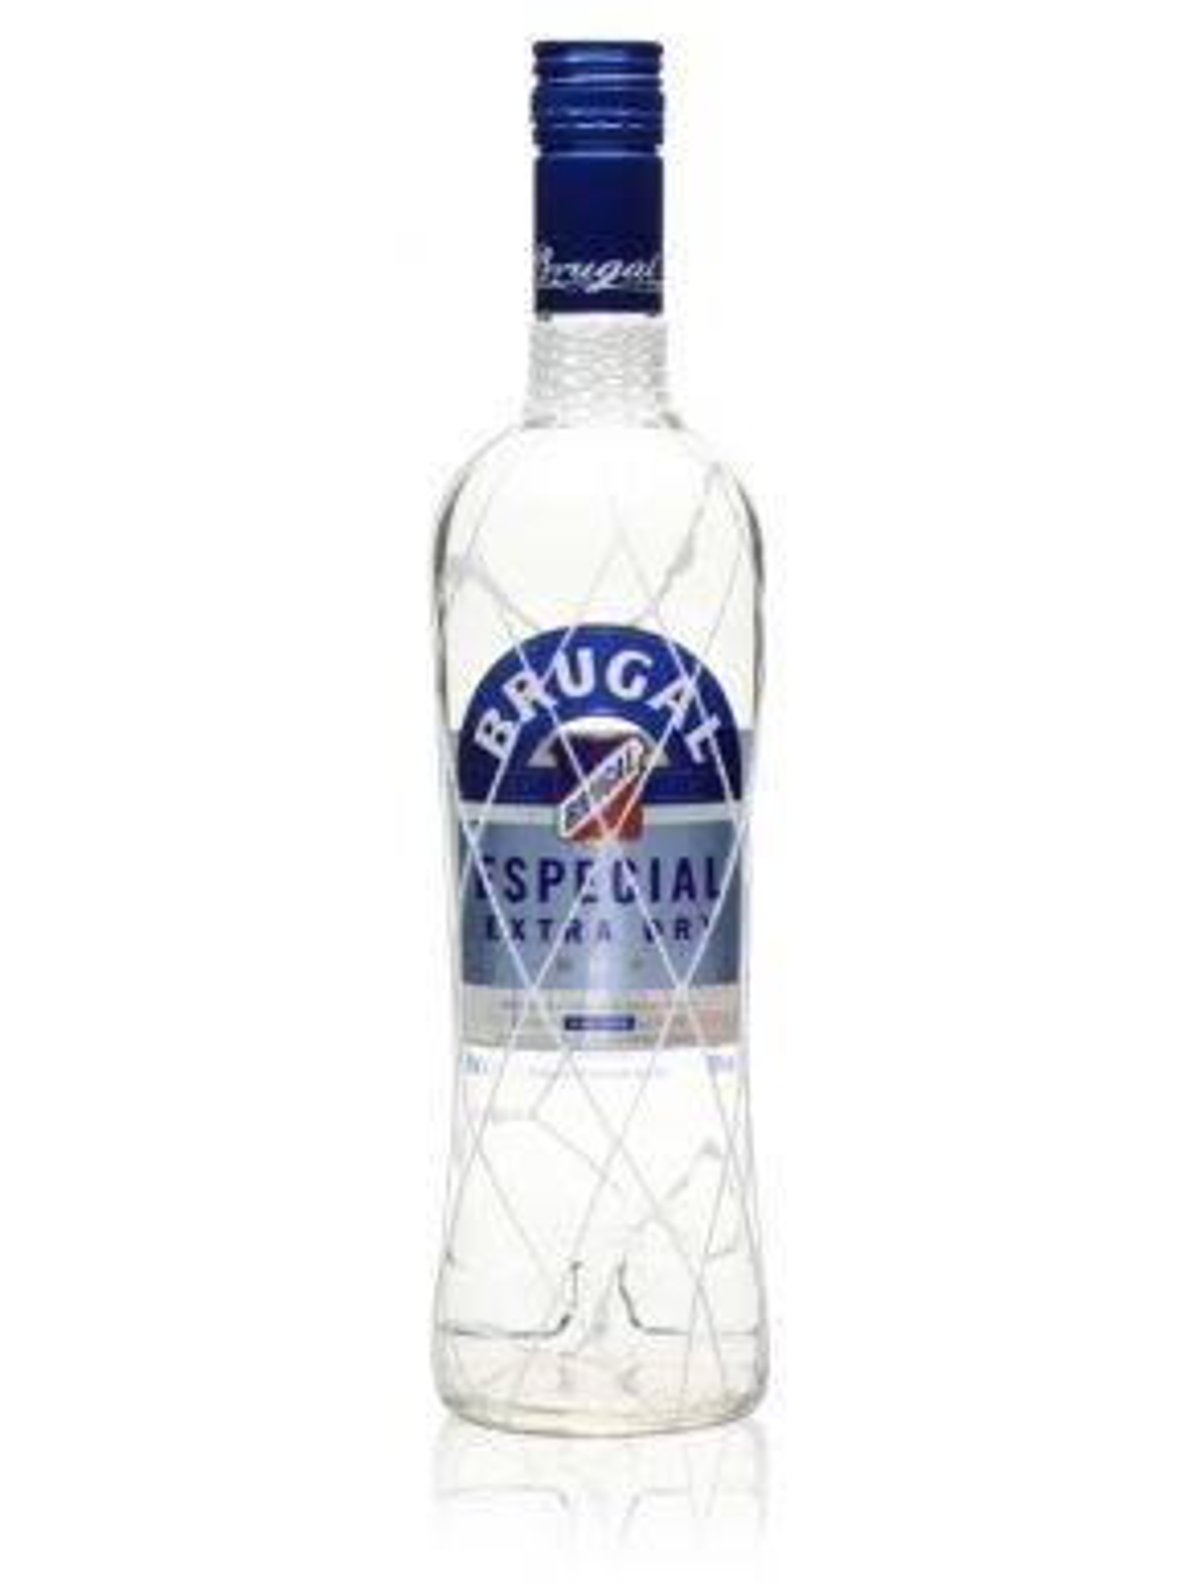 Brugal Especial Extra Dry (Prev Blanco) Rum 70cl